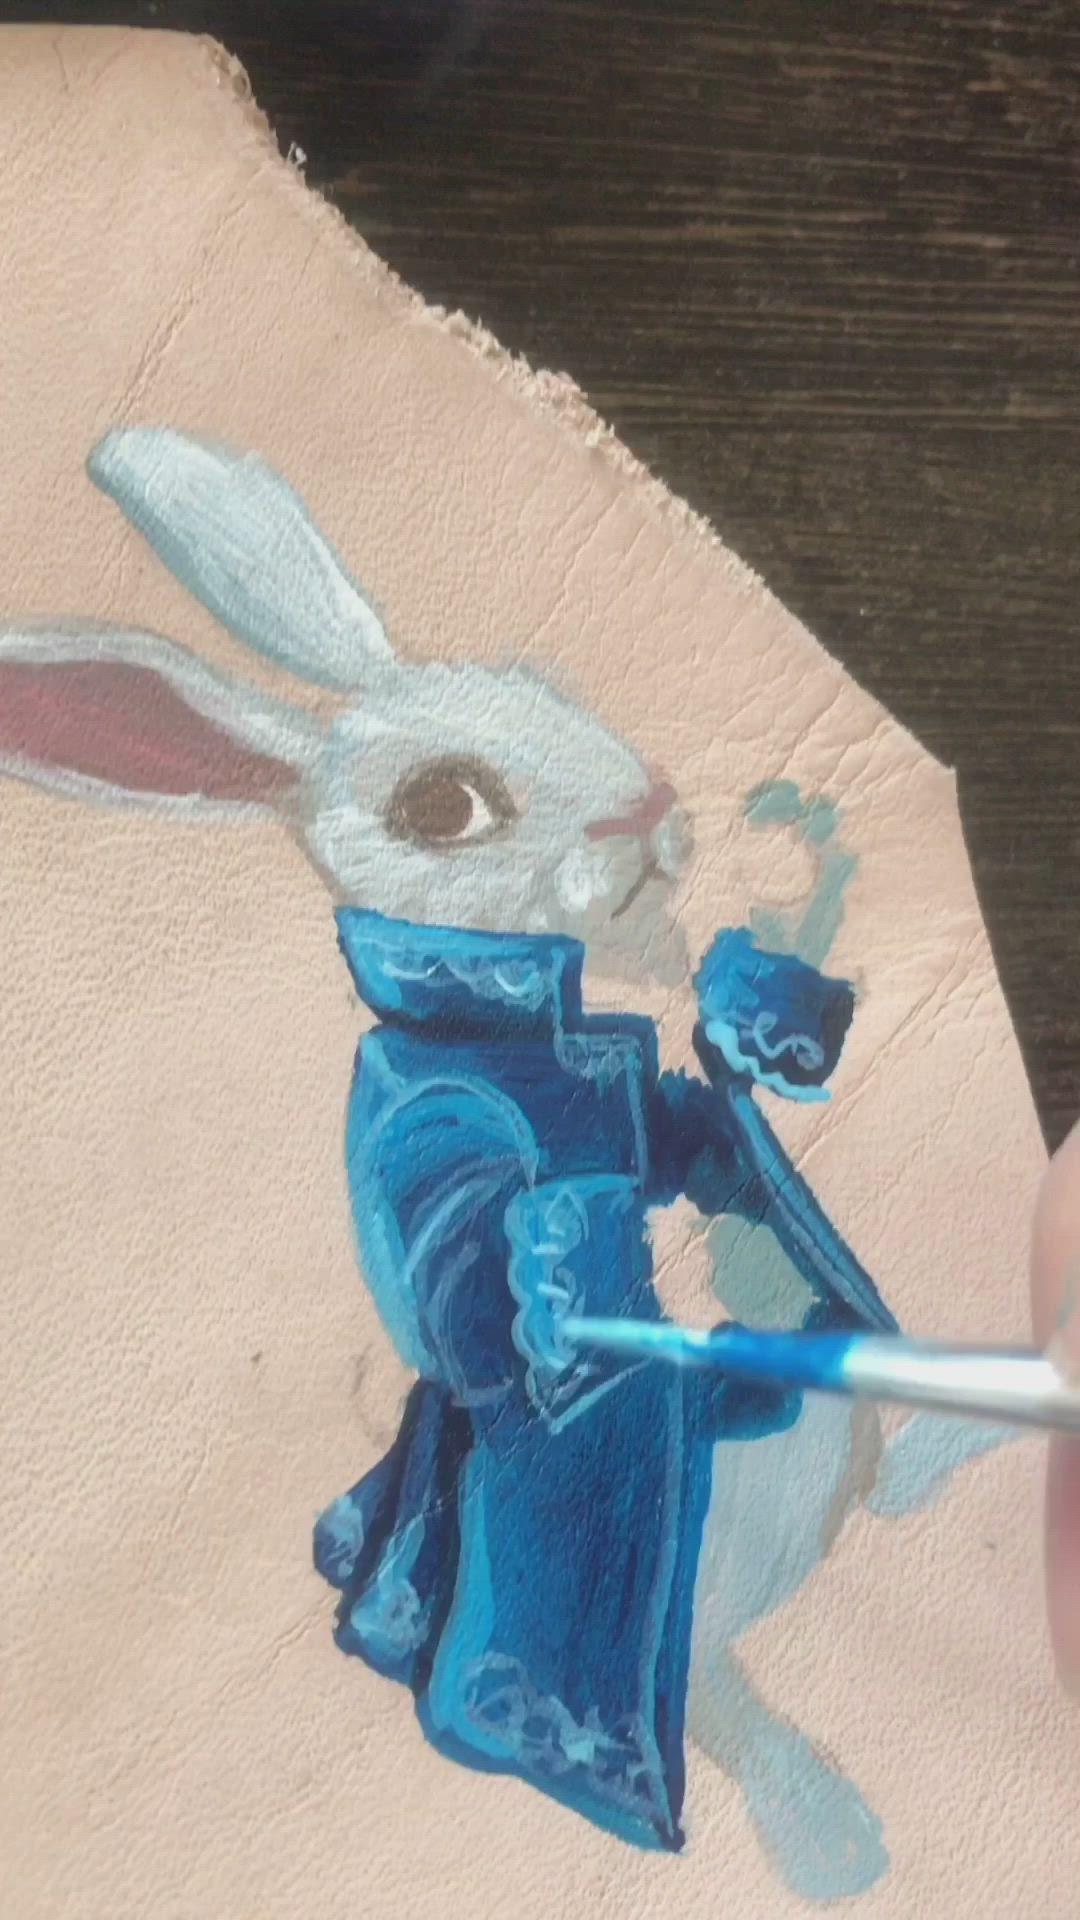 Tea Party Pin Birthday Gift White Rabbit Brooch Mad TEa Party Rabbit pin Bridal Shower Stocking Stuffer Alice in Wonderland pin